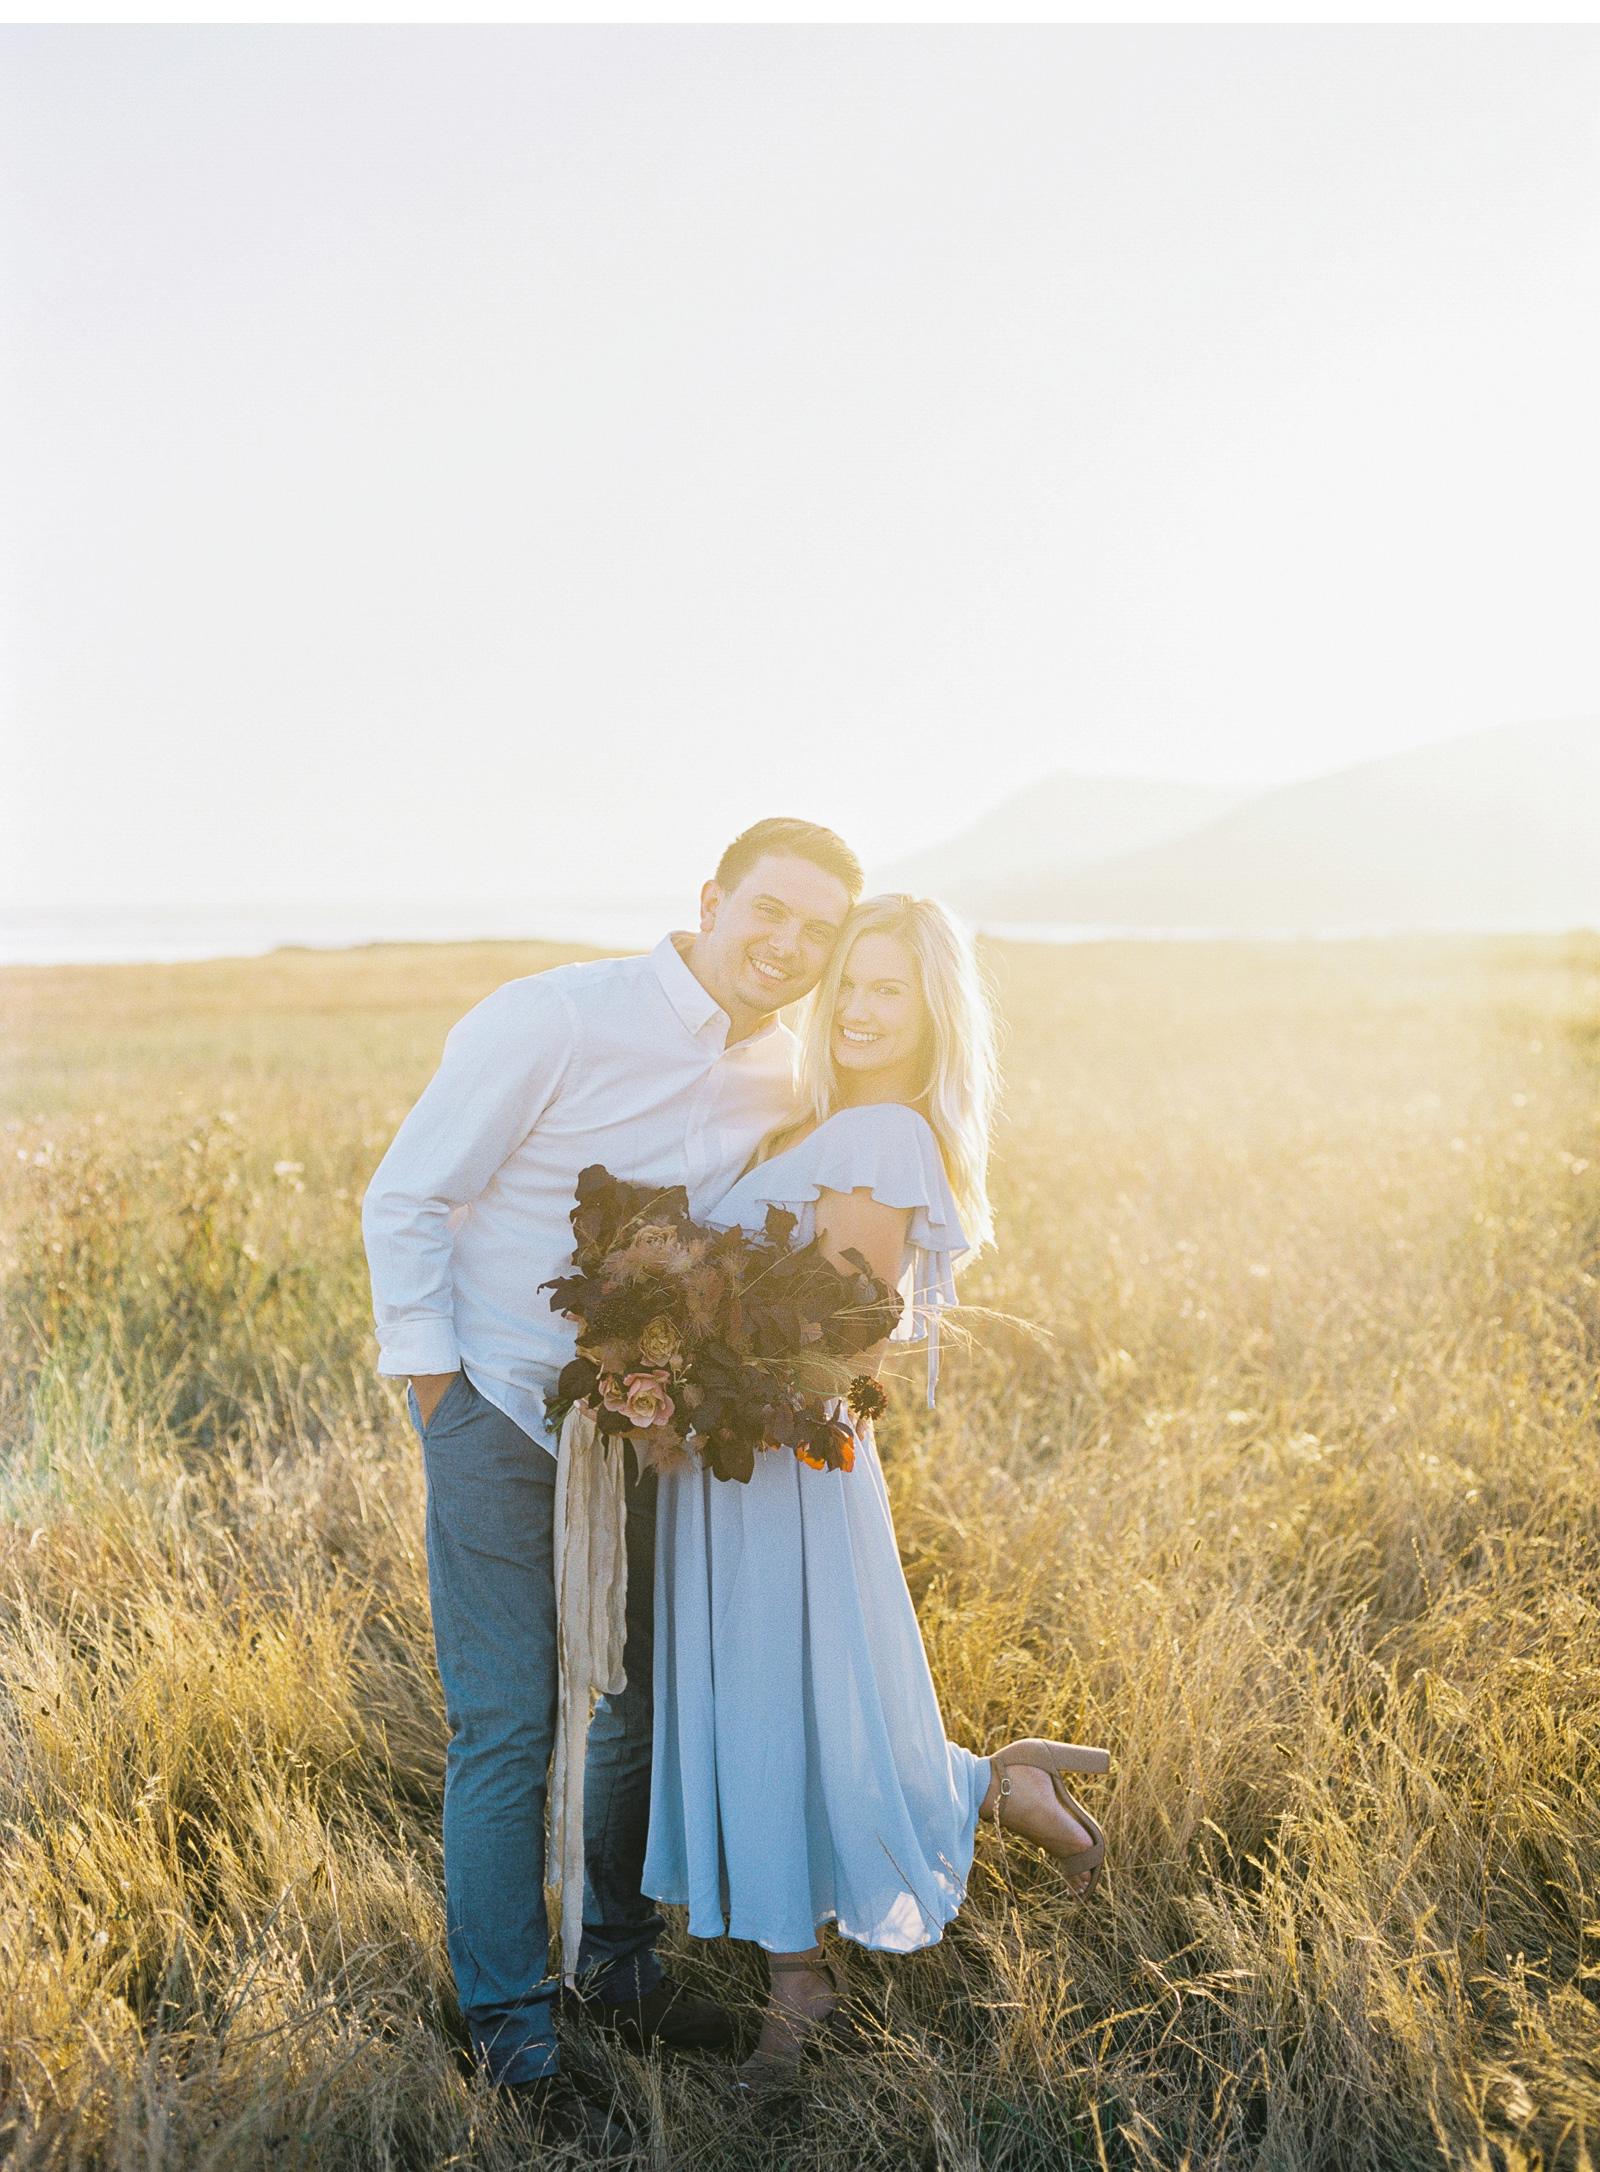 Malibu-Wedding-Photographer-Natalie-Schutt-Photography_06.jpg